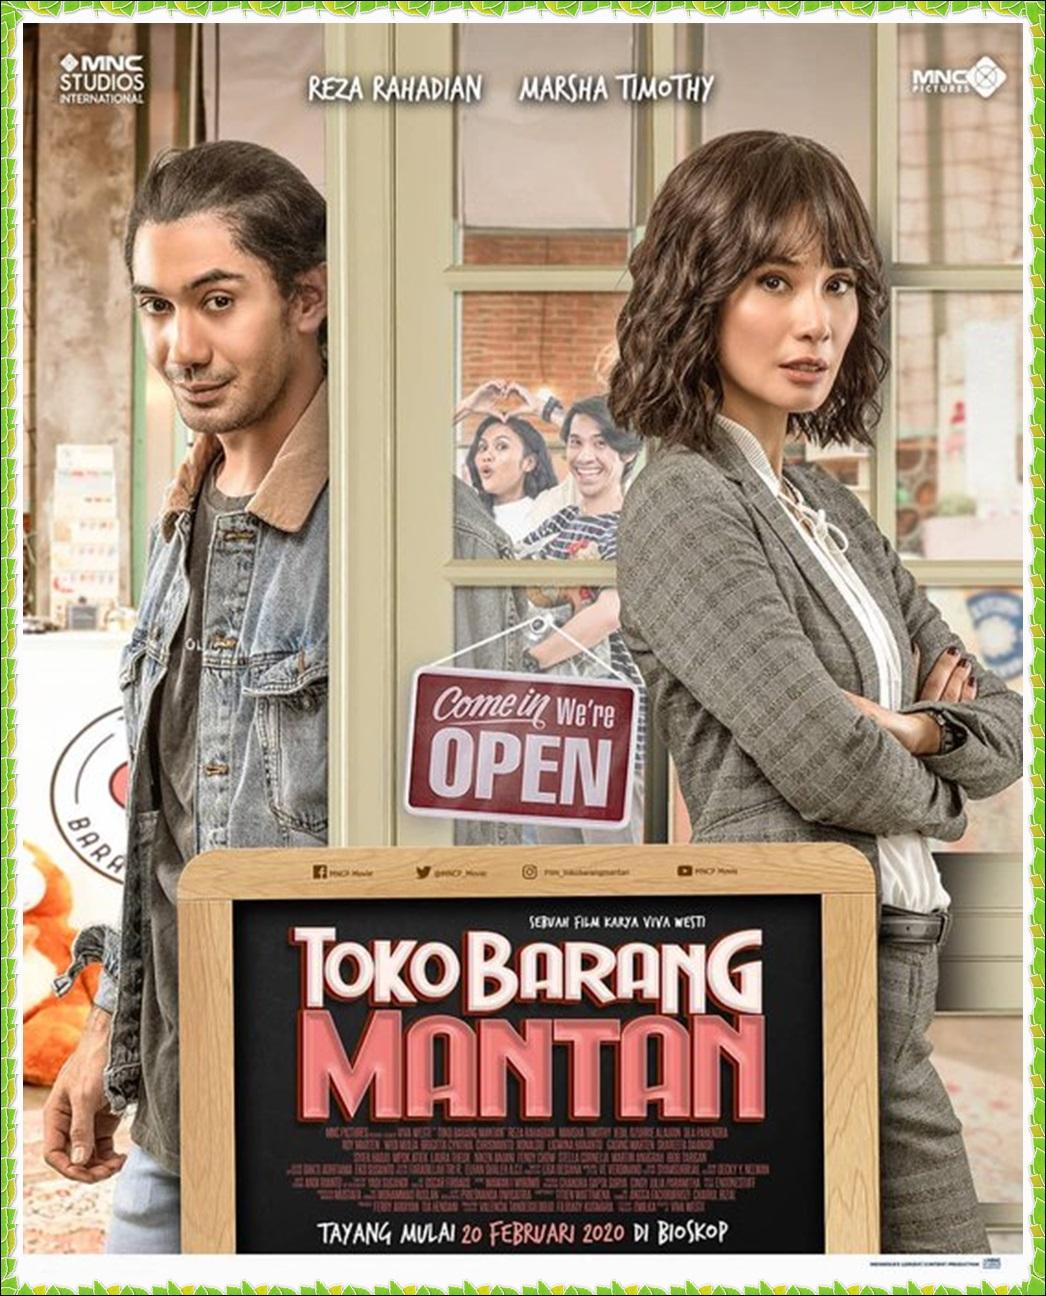 Donwload Film Toko Barang Mantan Full Movie (Lengkap) 2020